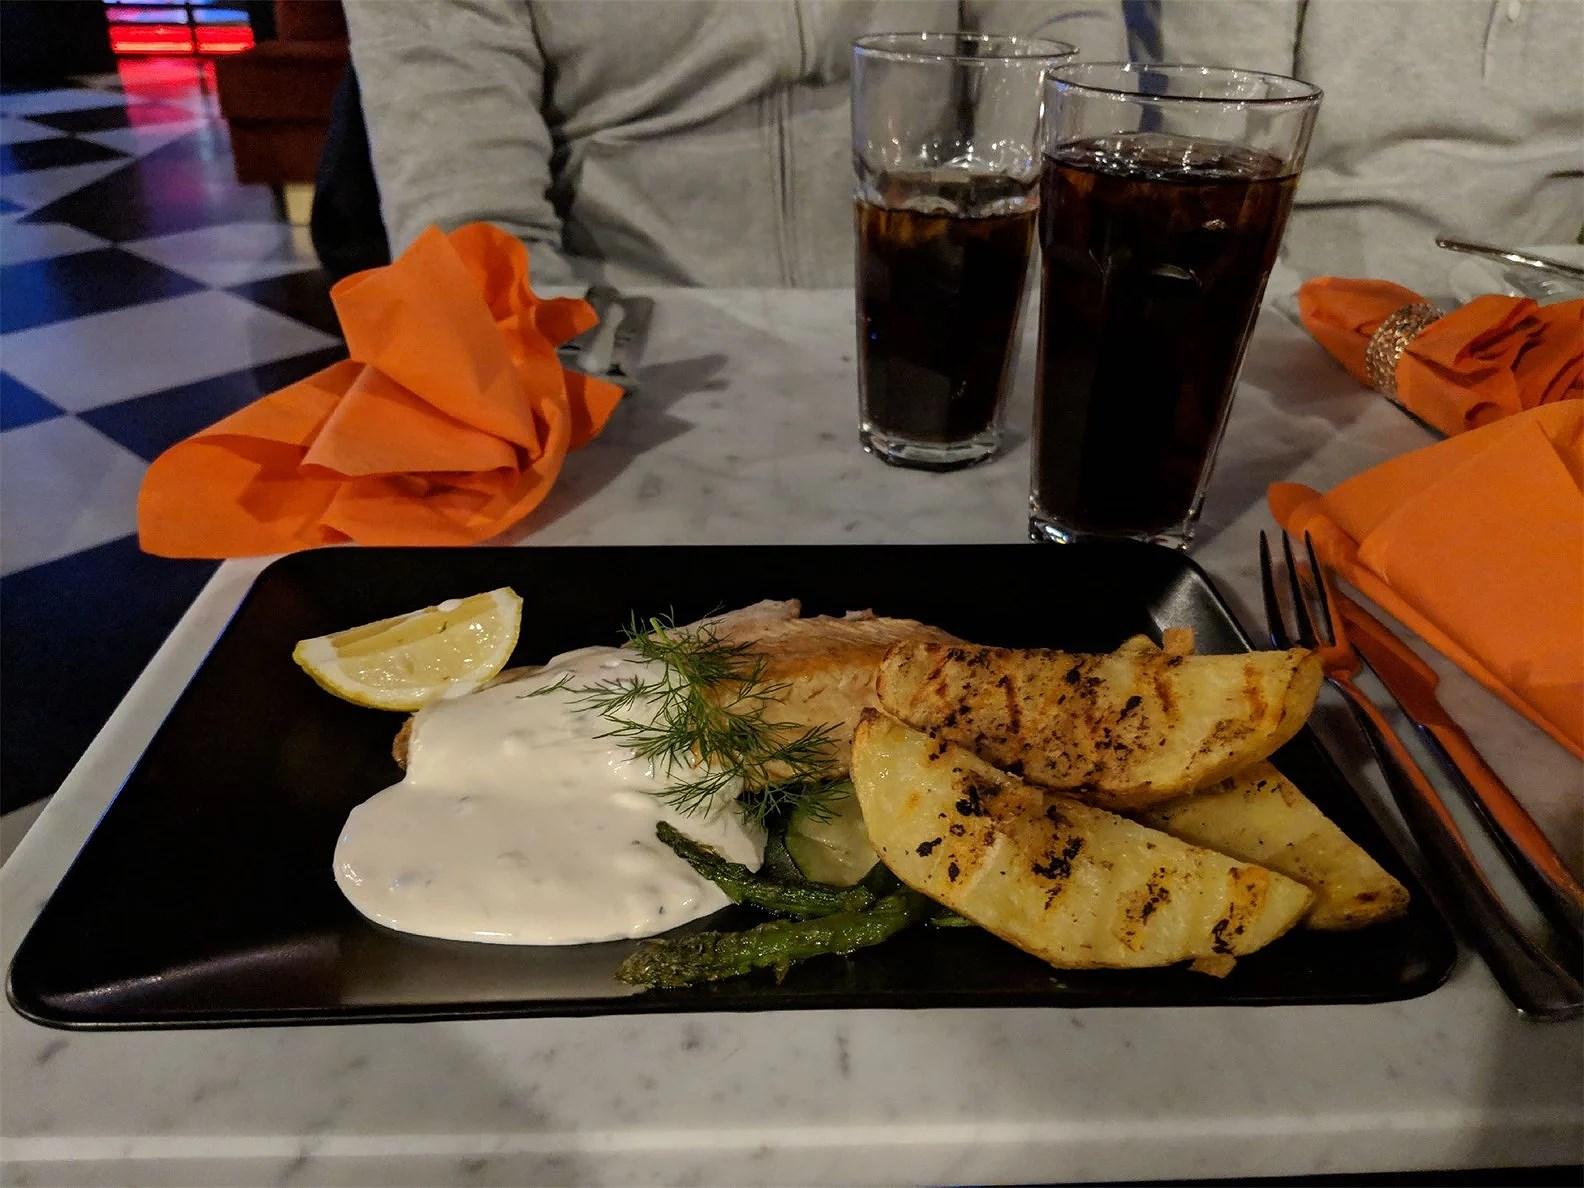 Dålig kock på nyöppnad restaurang